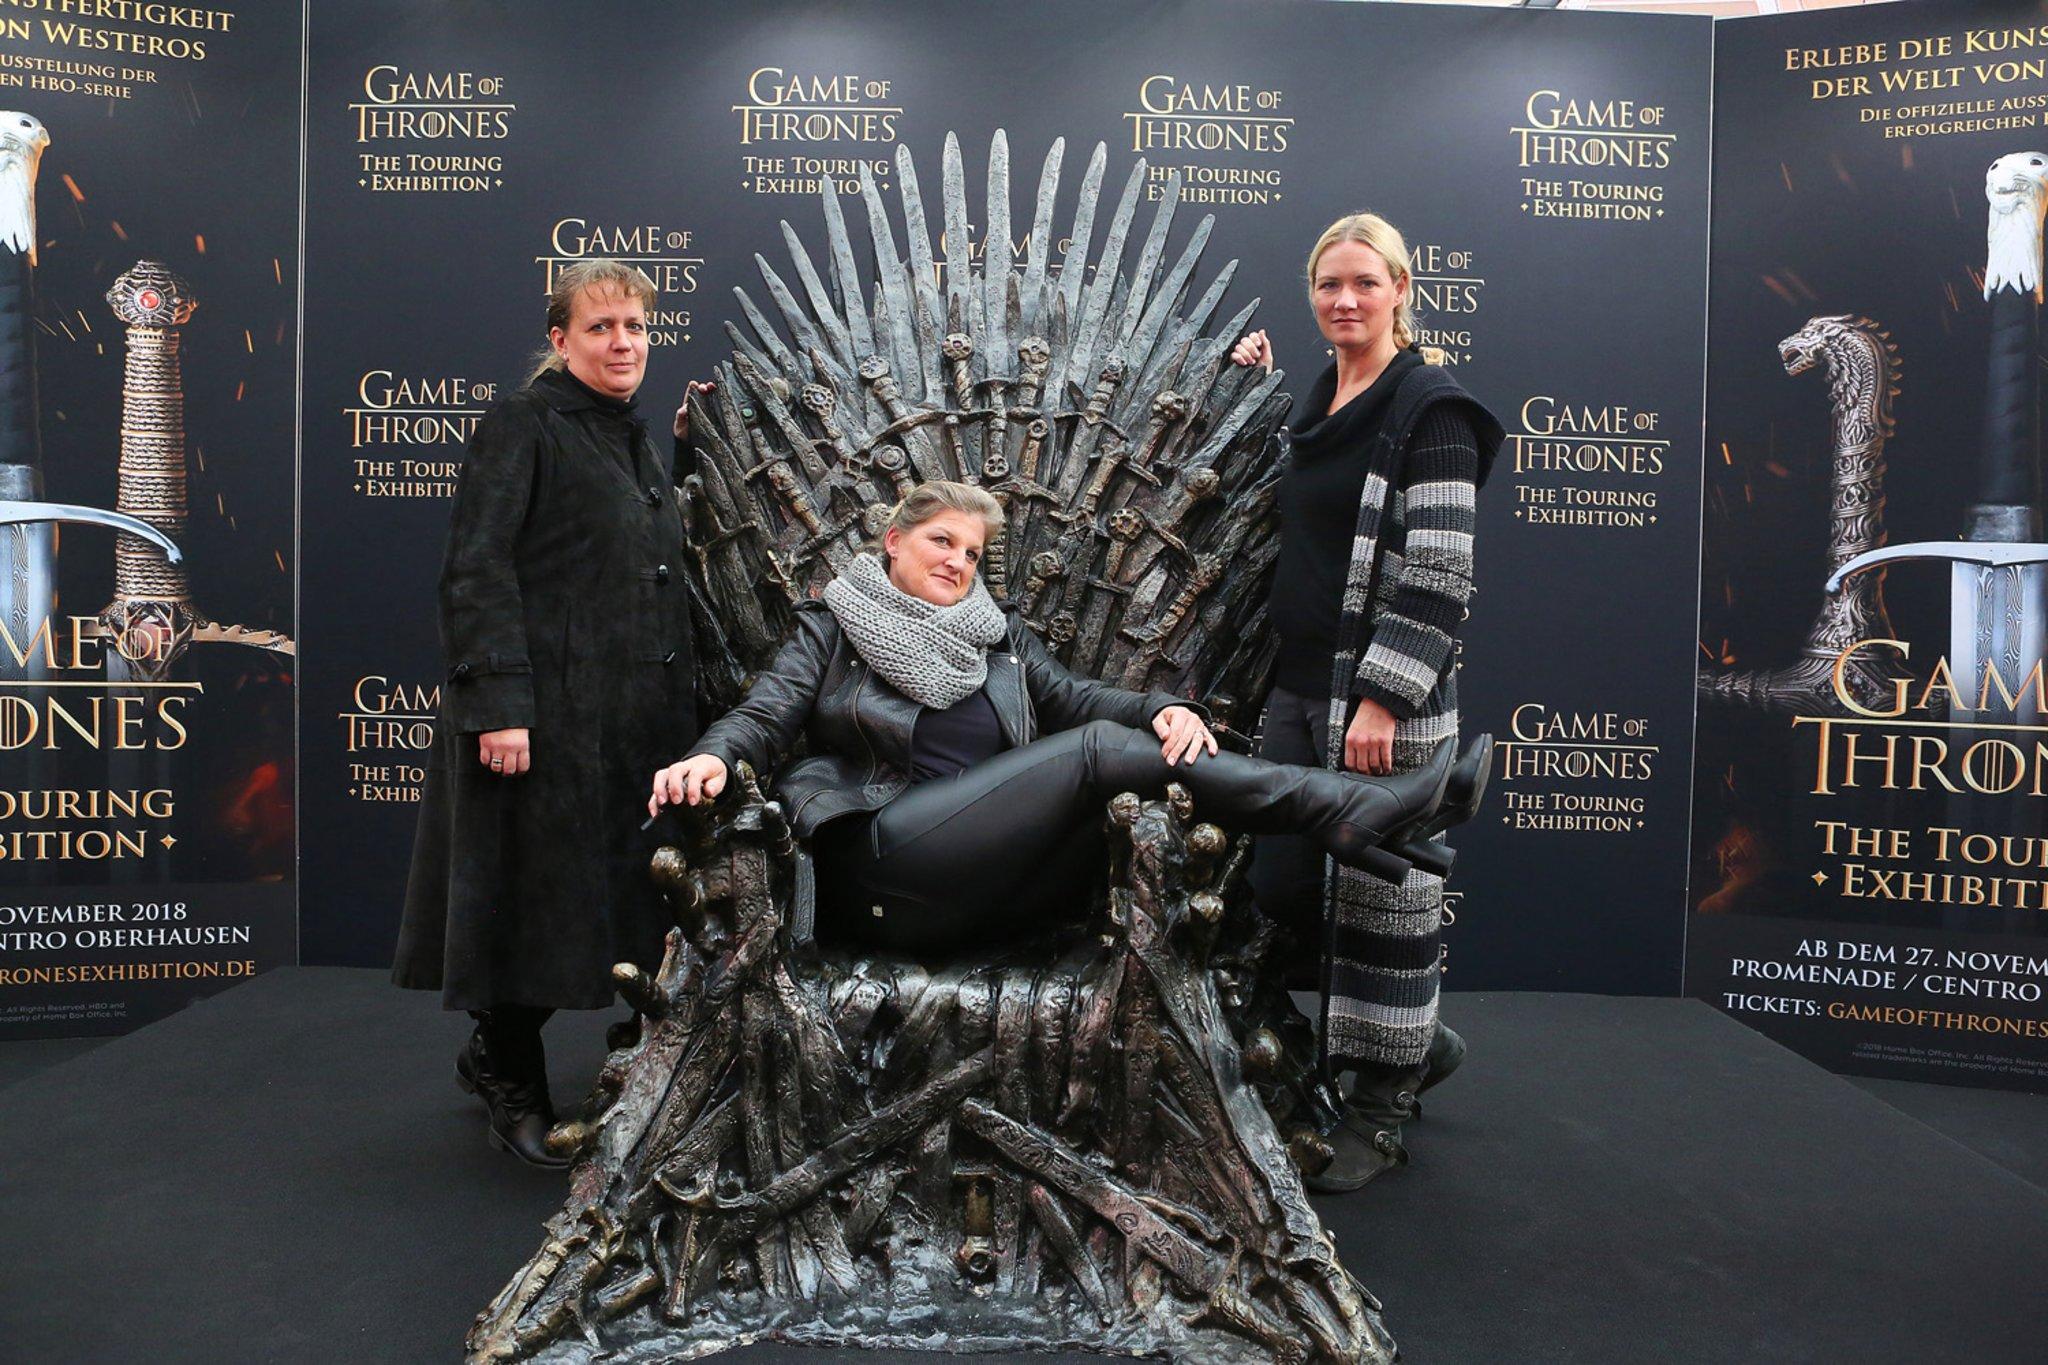 Der Winter Kommt Game Of Thrones